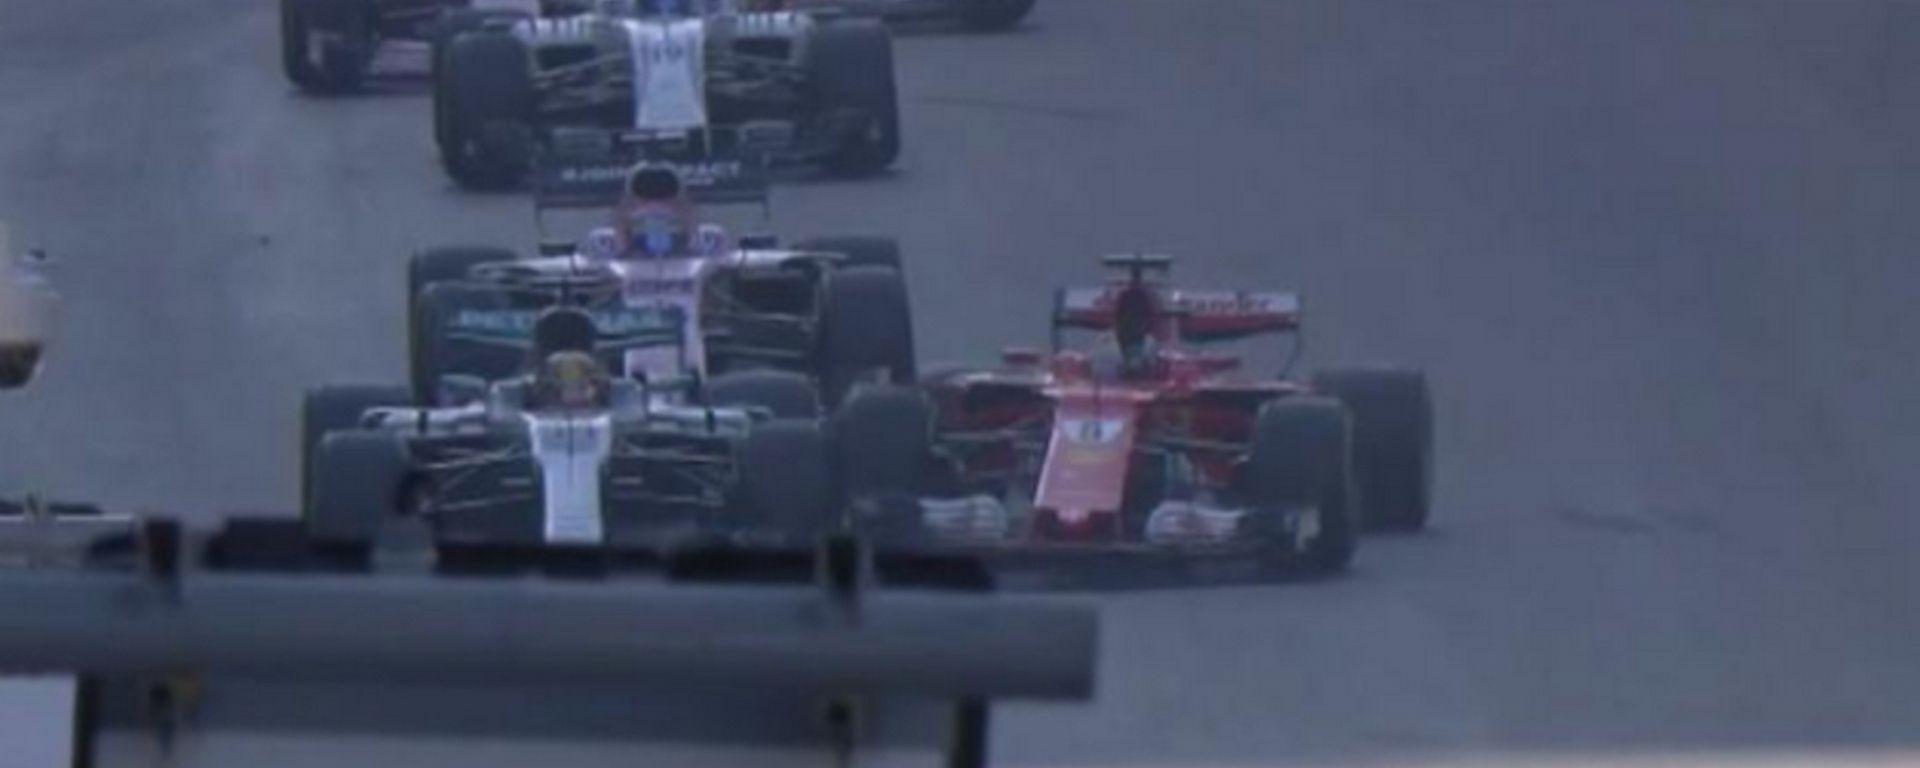 La sportellata di Sebastian Vettel a Lewis Hamilton al GP di Baku di Formula 1